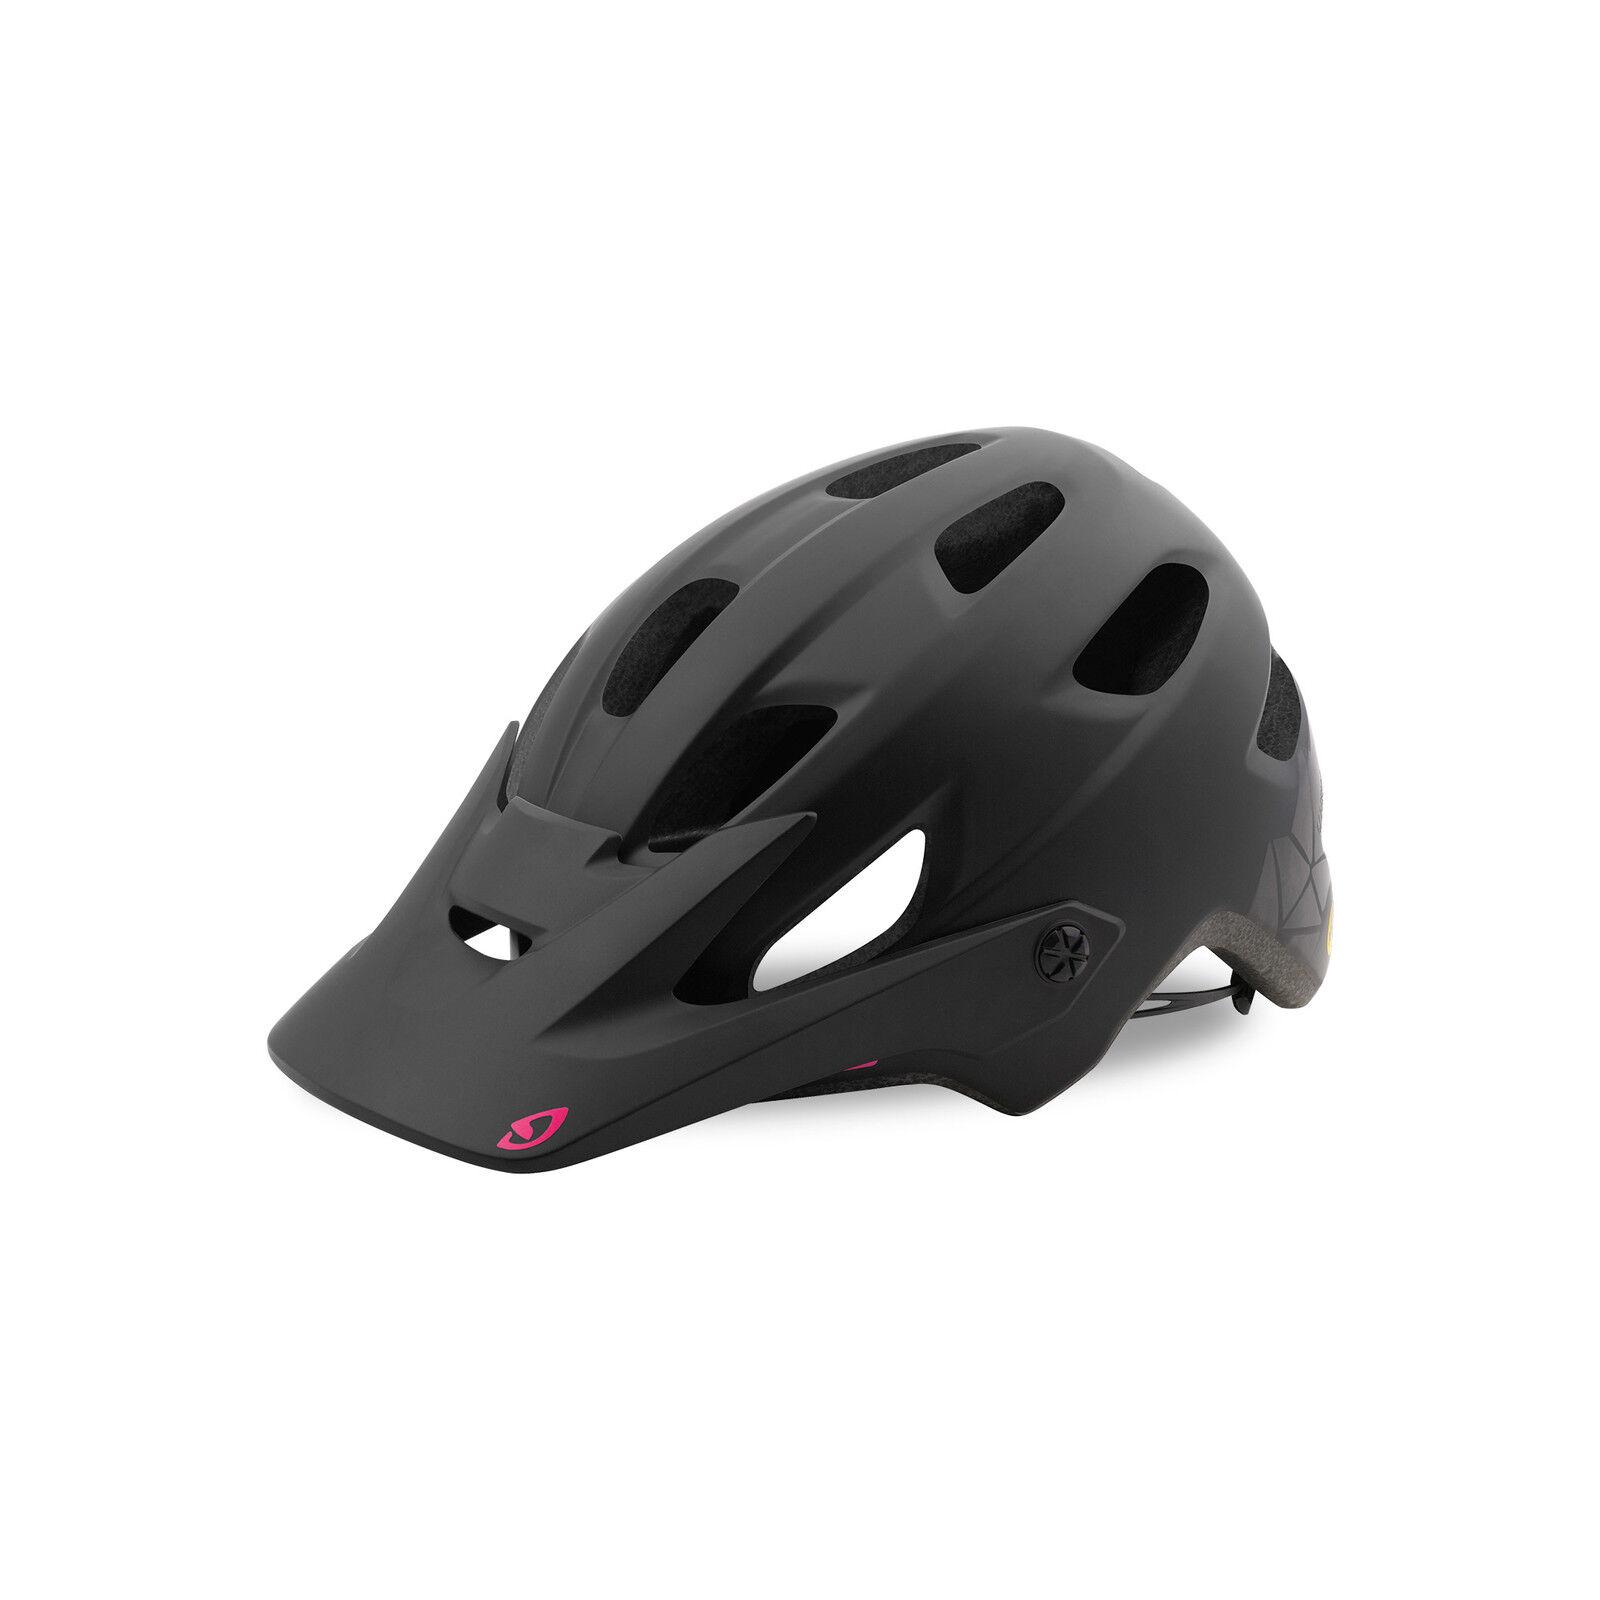 Giro cartelle MIPS donna All Mountain MTB Casco Bicicletta Nero rosa 2019